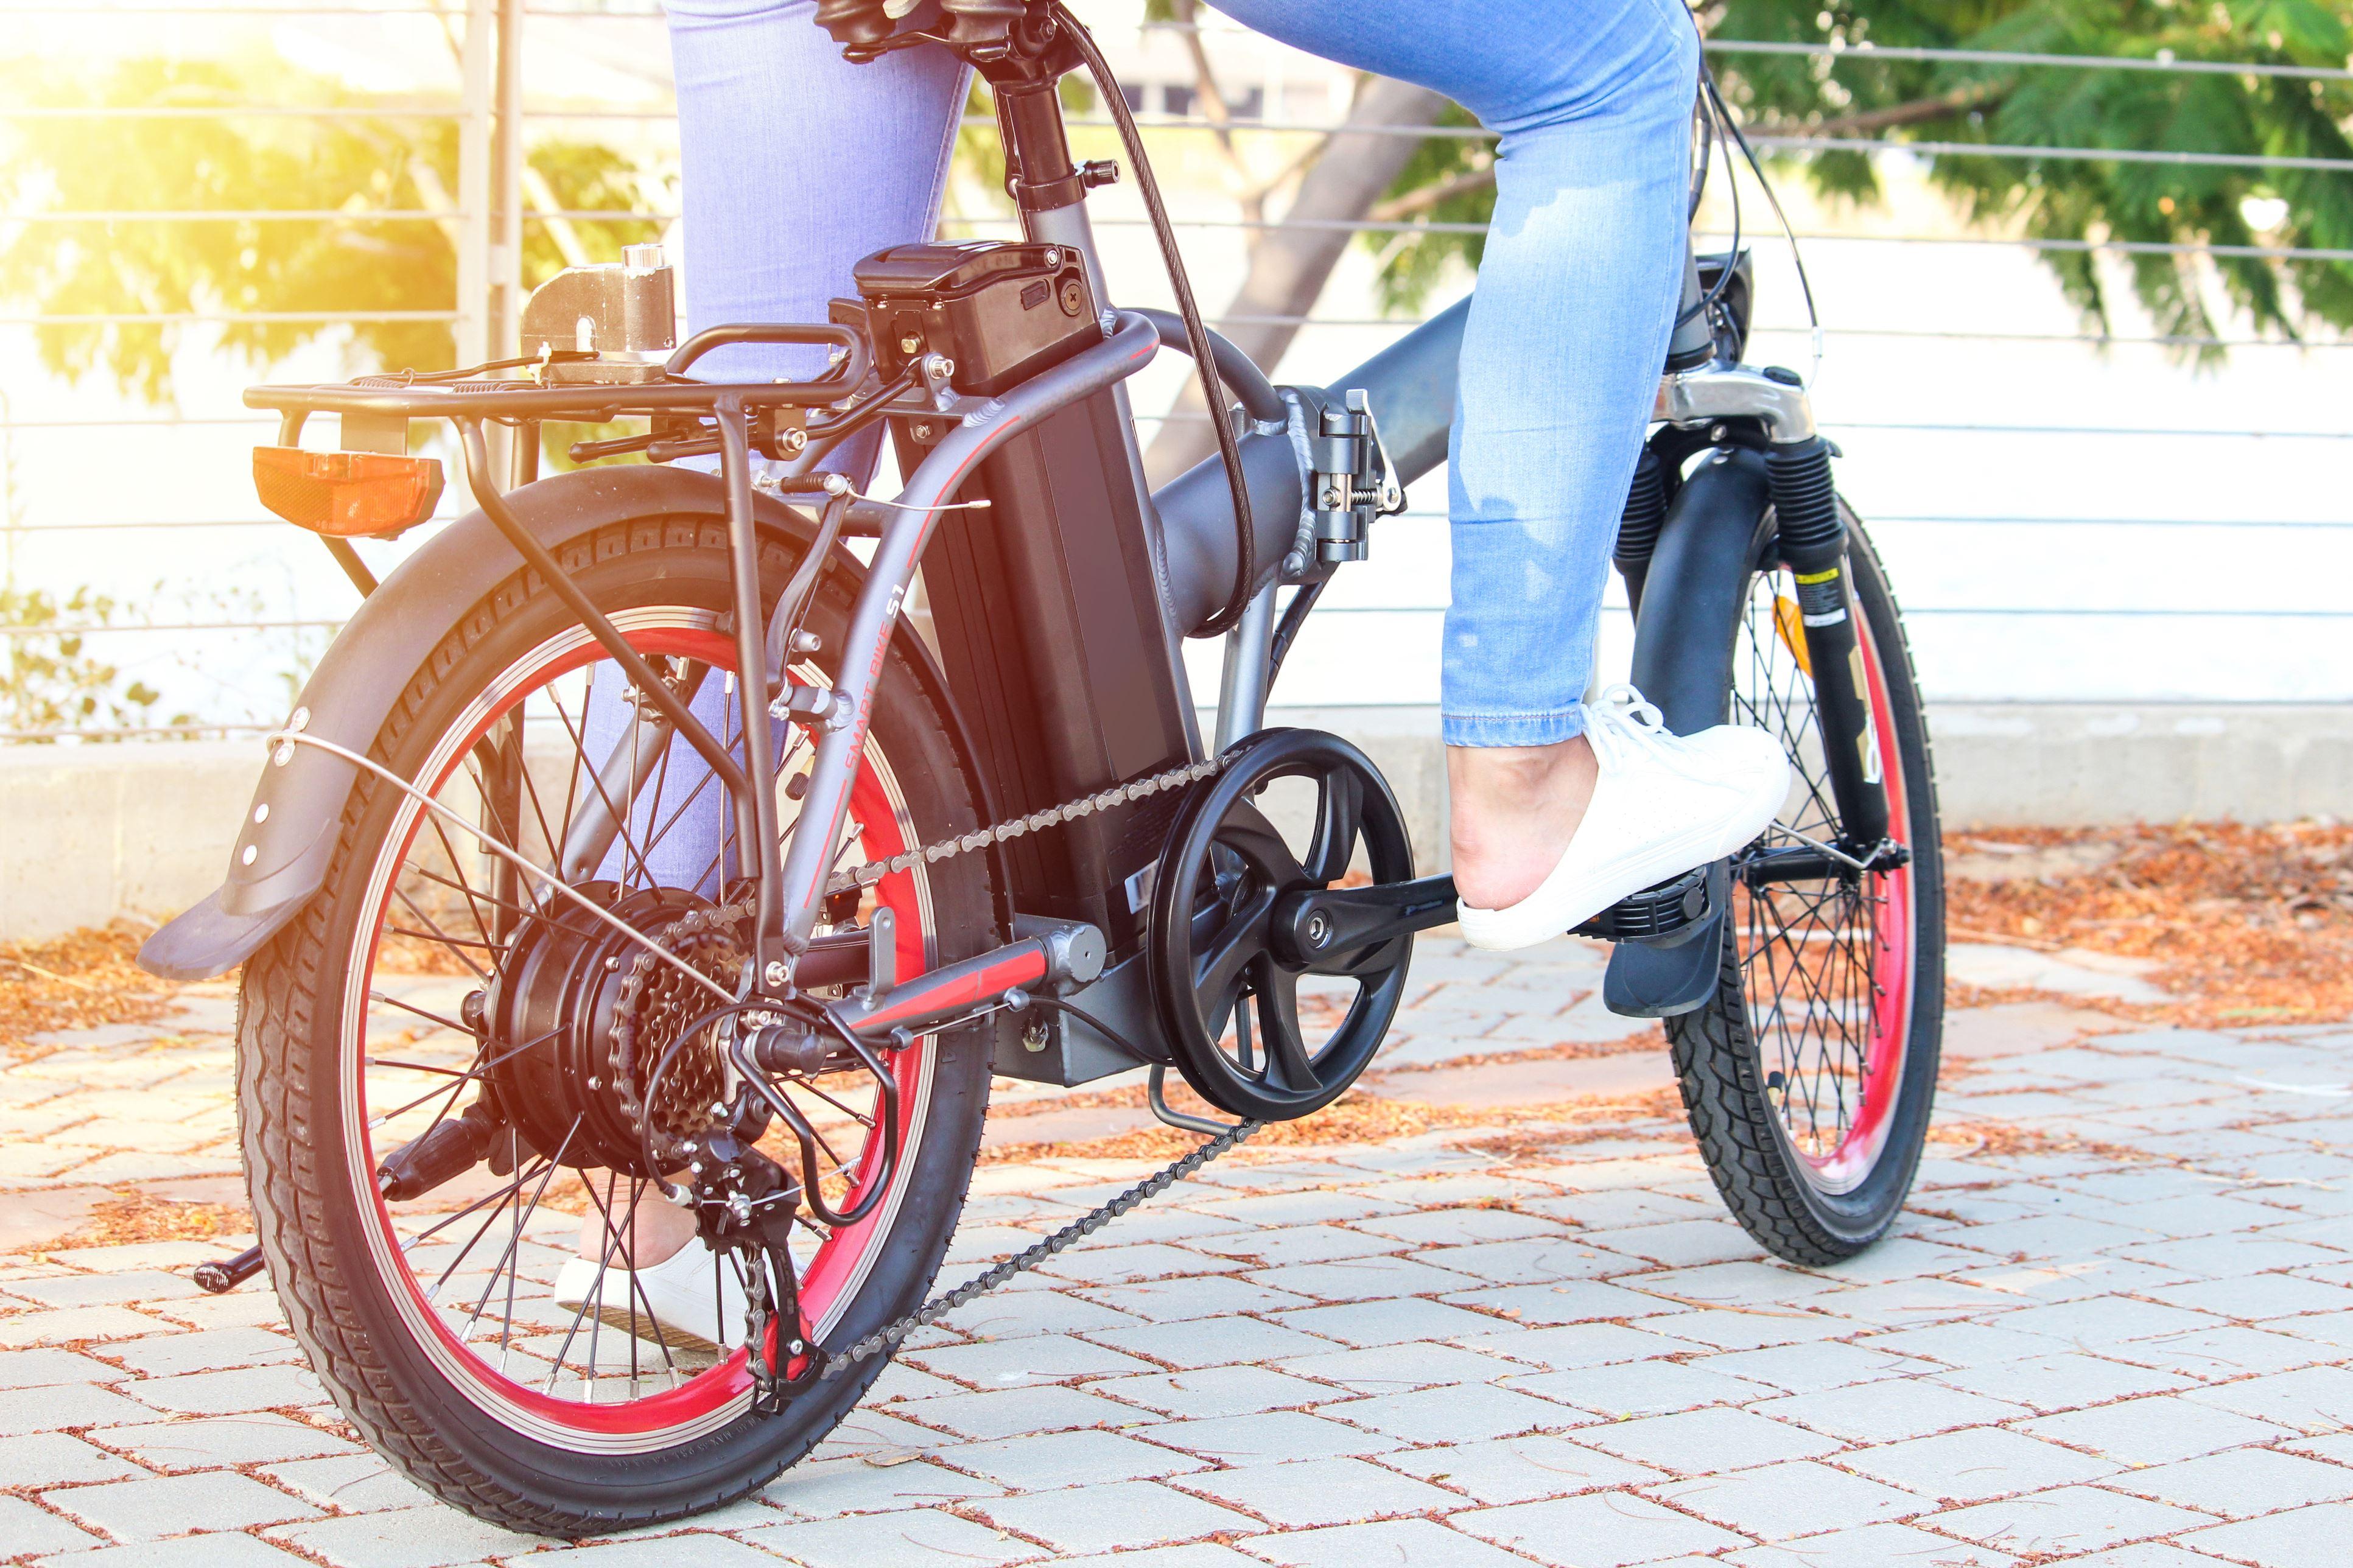 Dia Mundial sem Carros: 5 vantagens de utilizar veículos elétricos